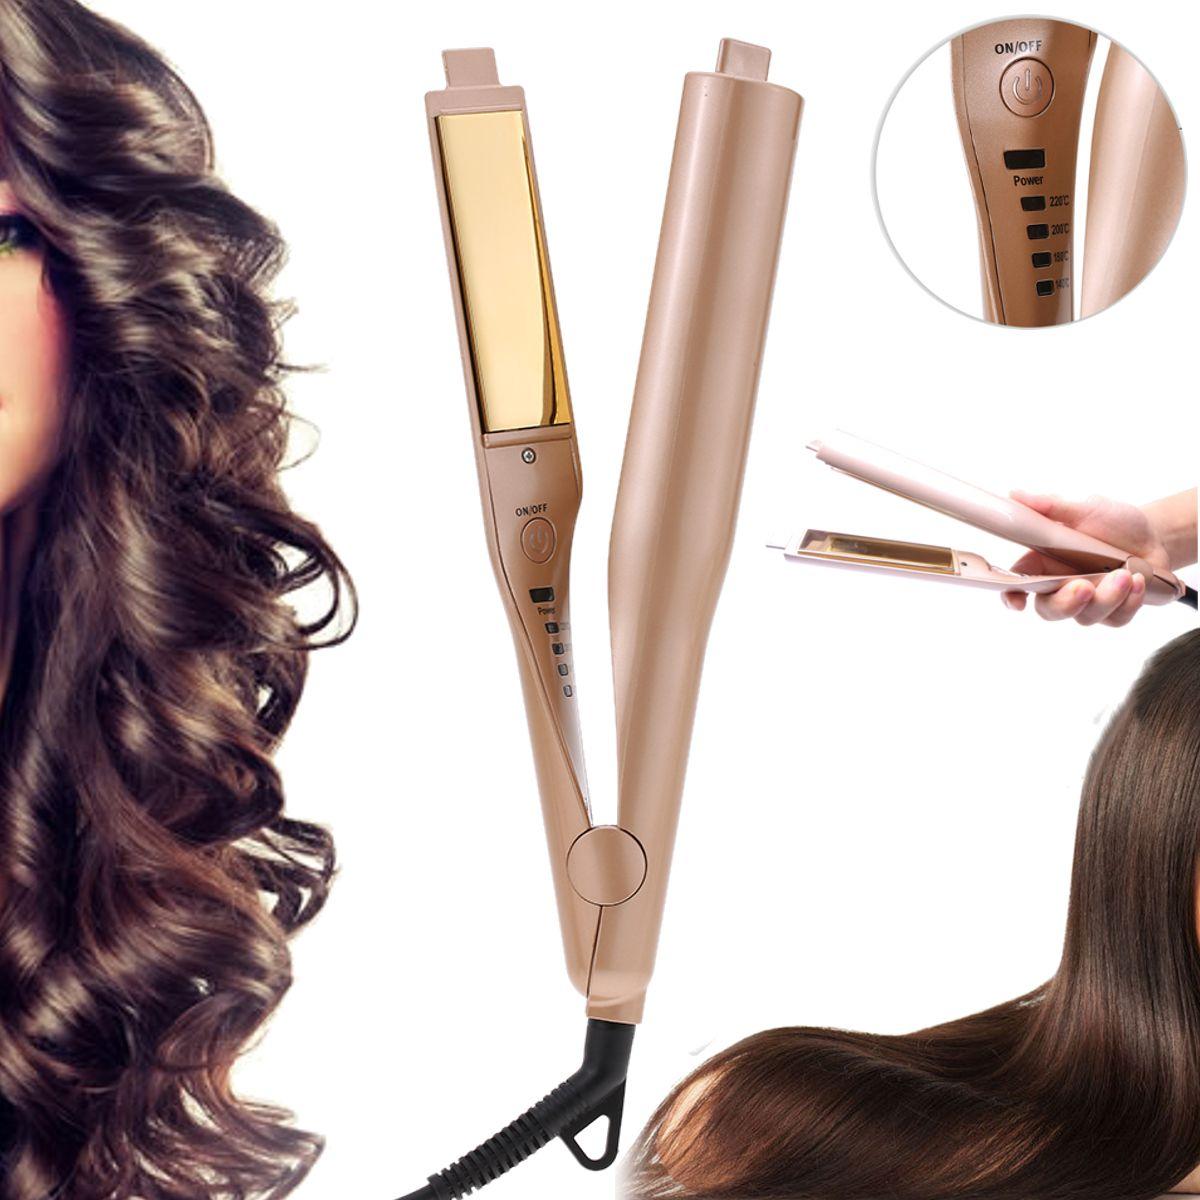 Gold 2 In 1 Ceramic Hair Curler Hair Straightener Hair Styling Curlers Irons Ceramic Hair Hair Curlers Hair Straightener And Curler